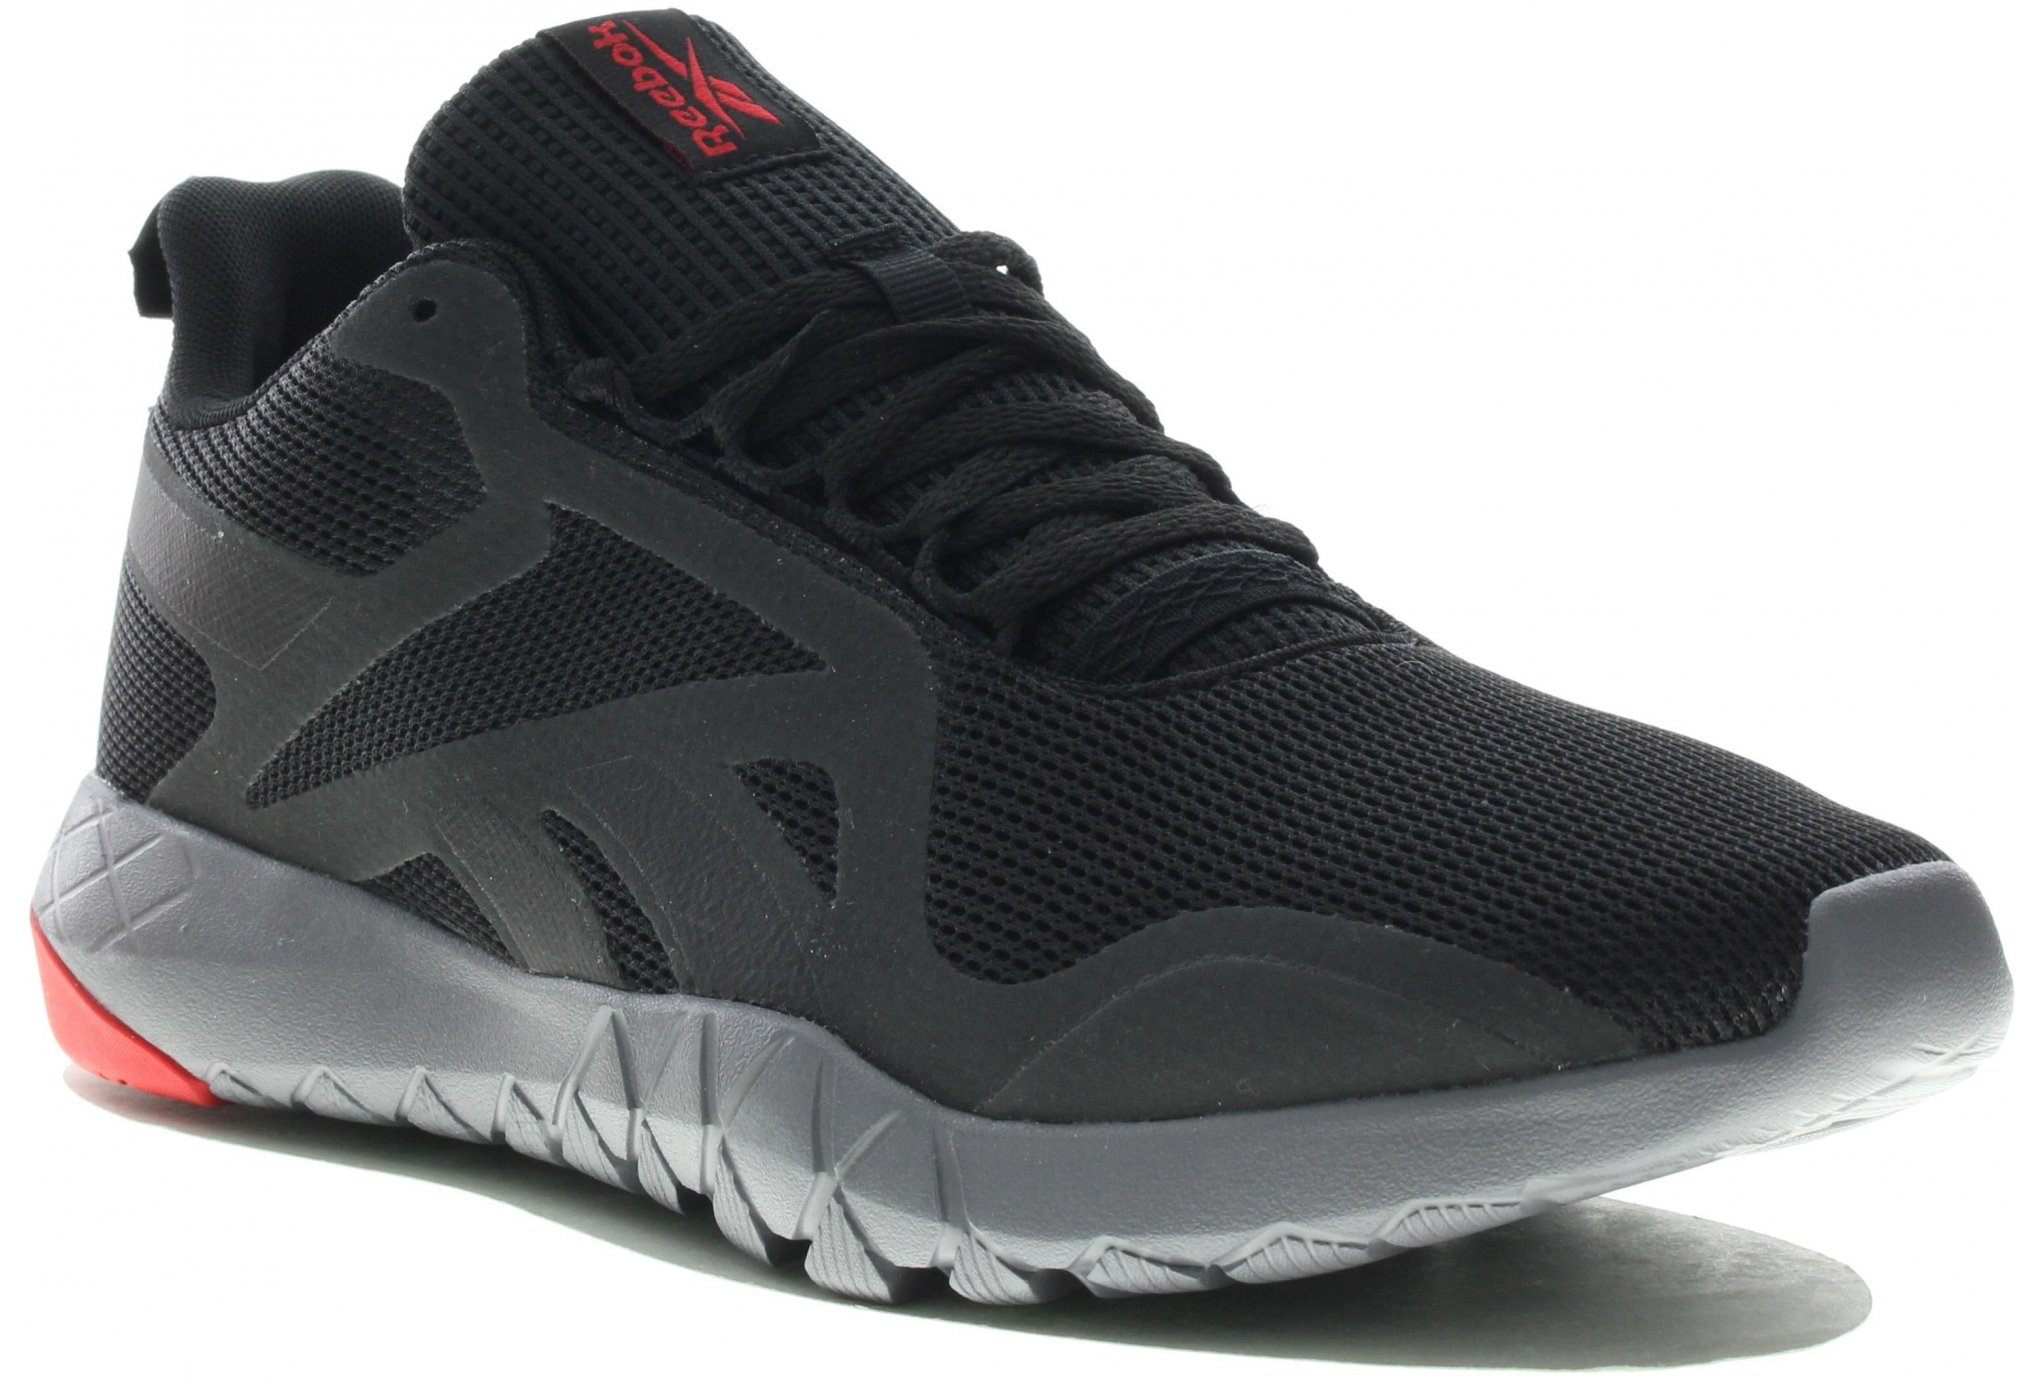 Reebok Flexagon Force 3.0 M Chaussures homme